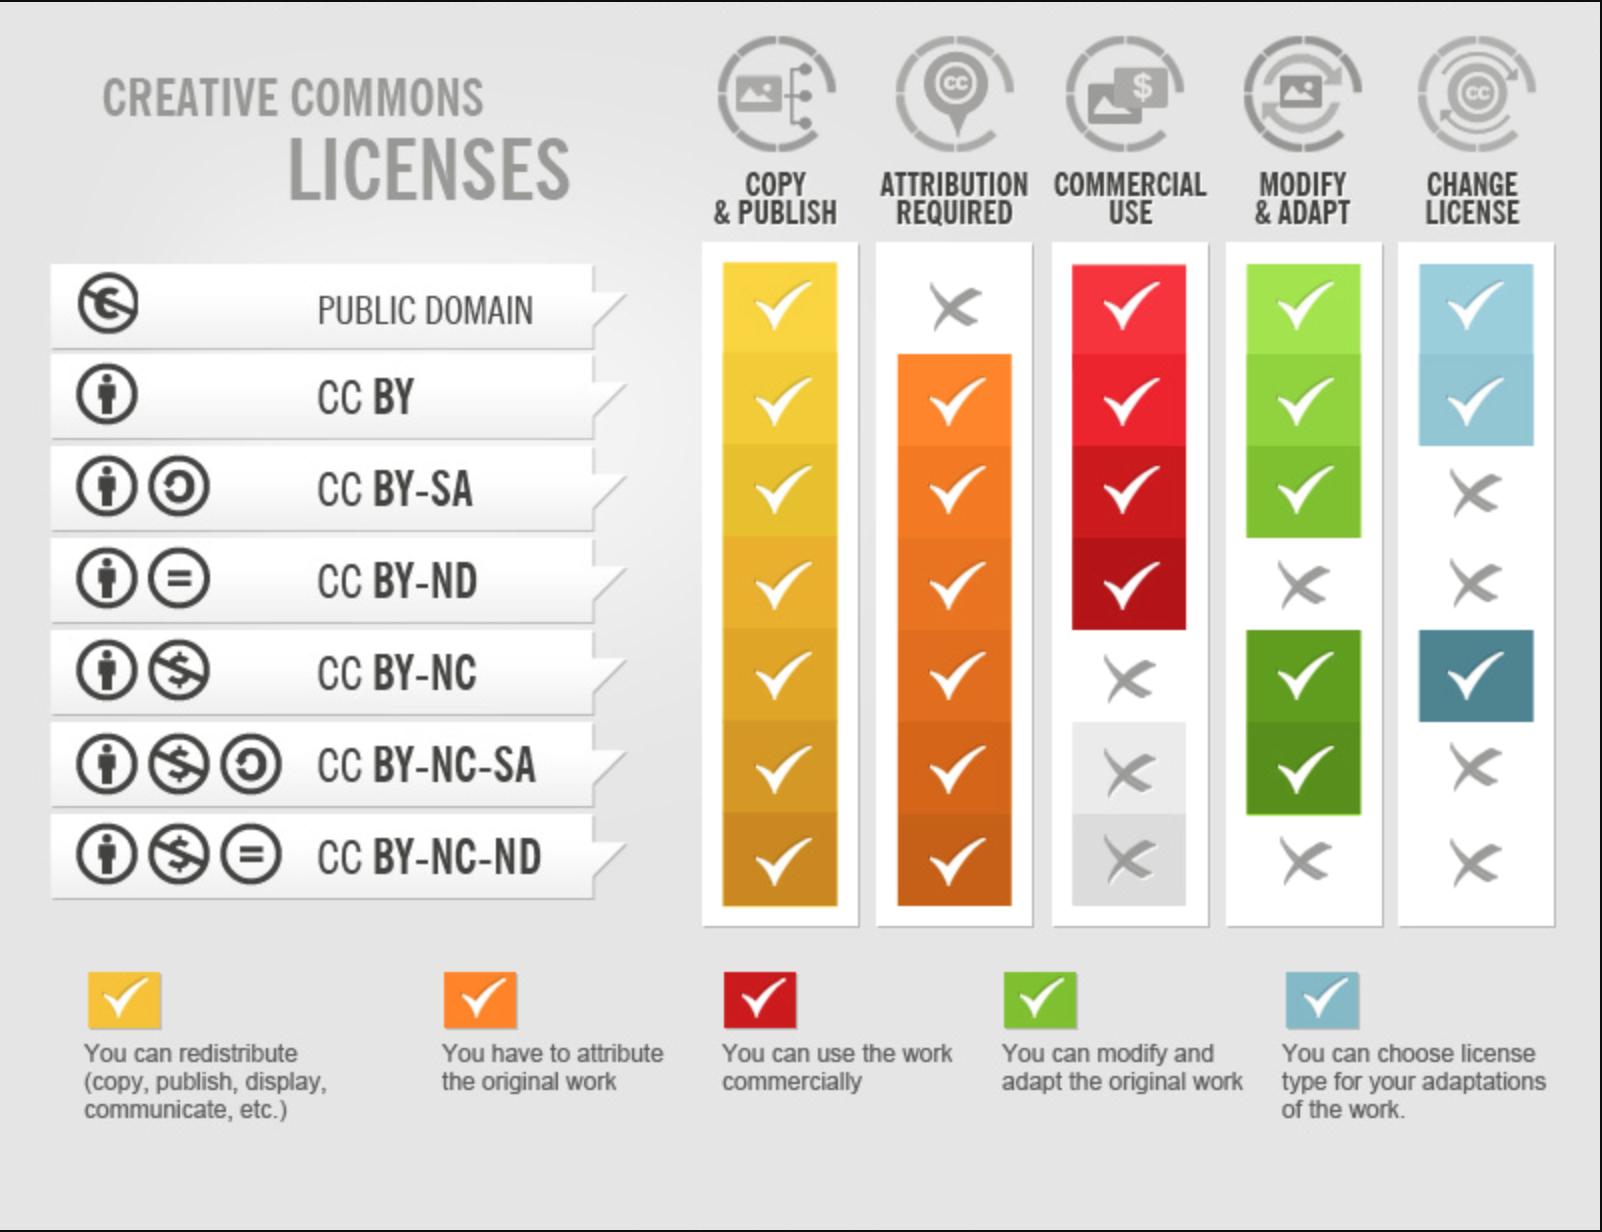 Description of Creative Commons licenses